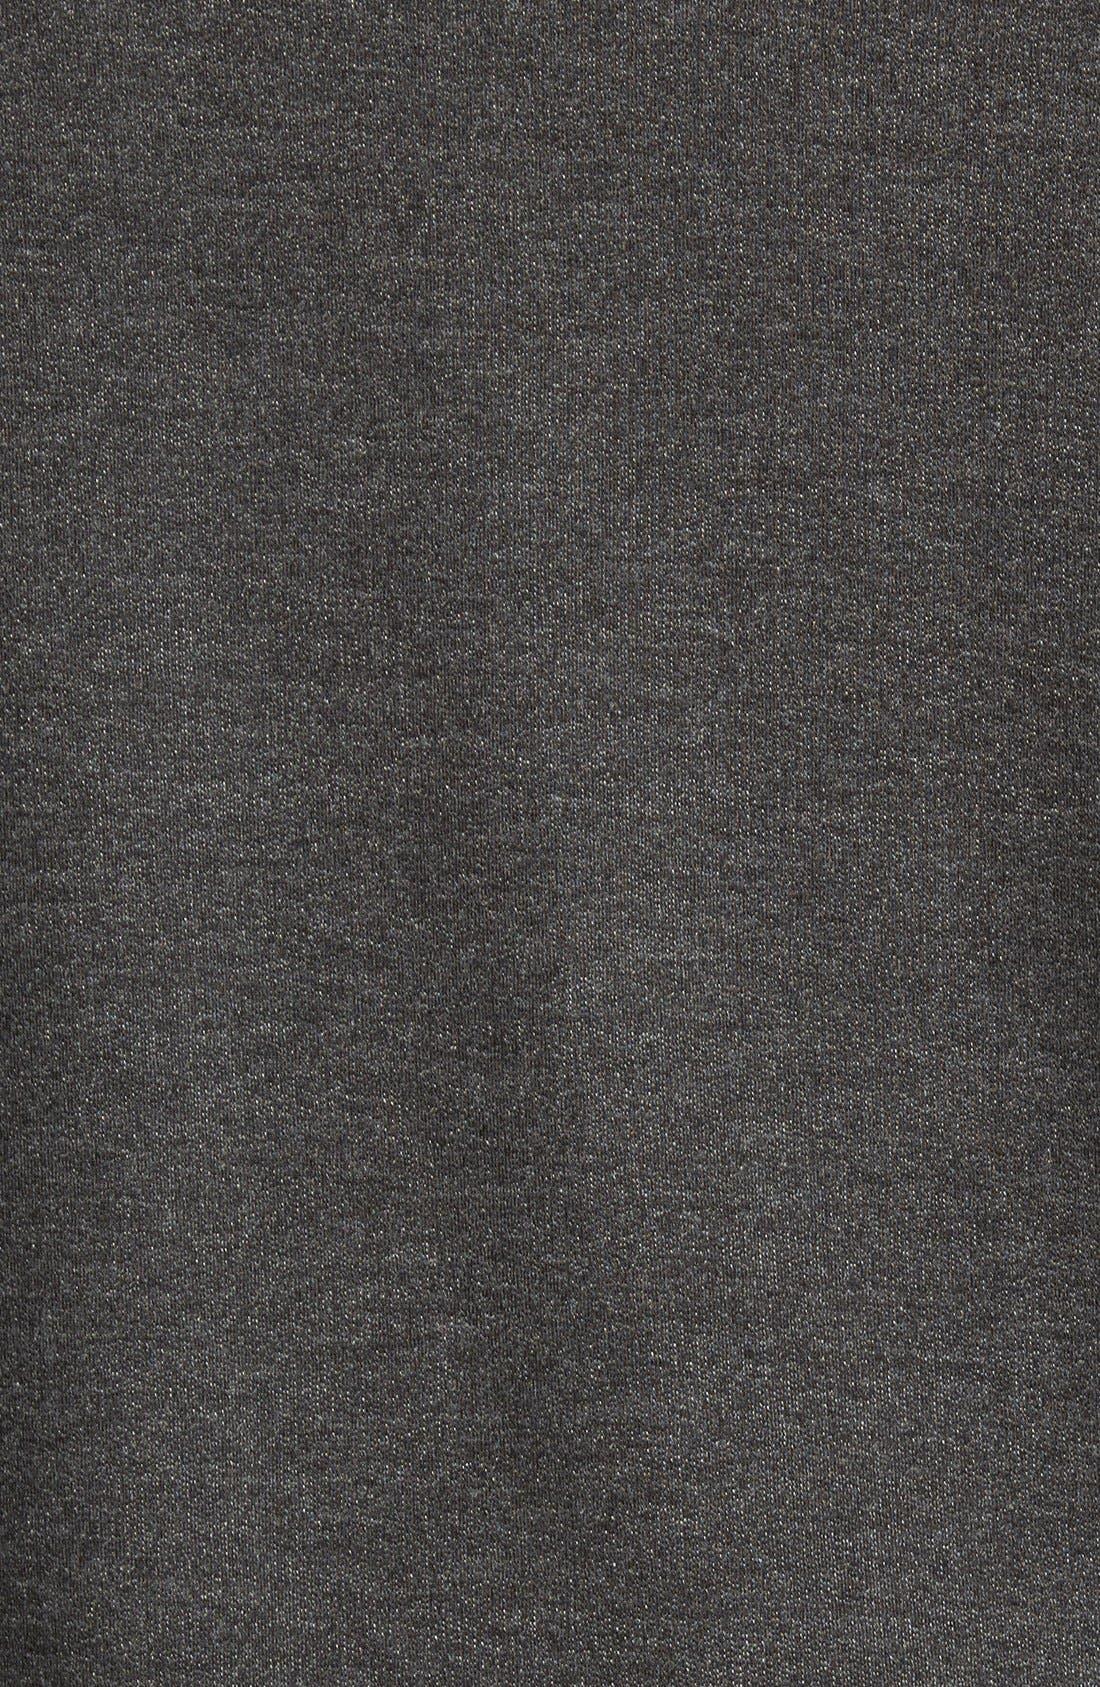 NIKE,                             Dri-FIT Touch Fleece Full Zip Hoodie,                             Alternate thumbnail 2, color,                             010